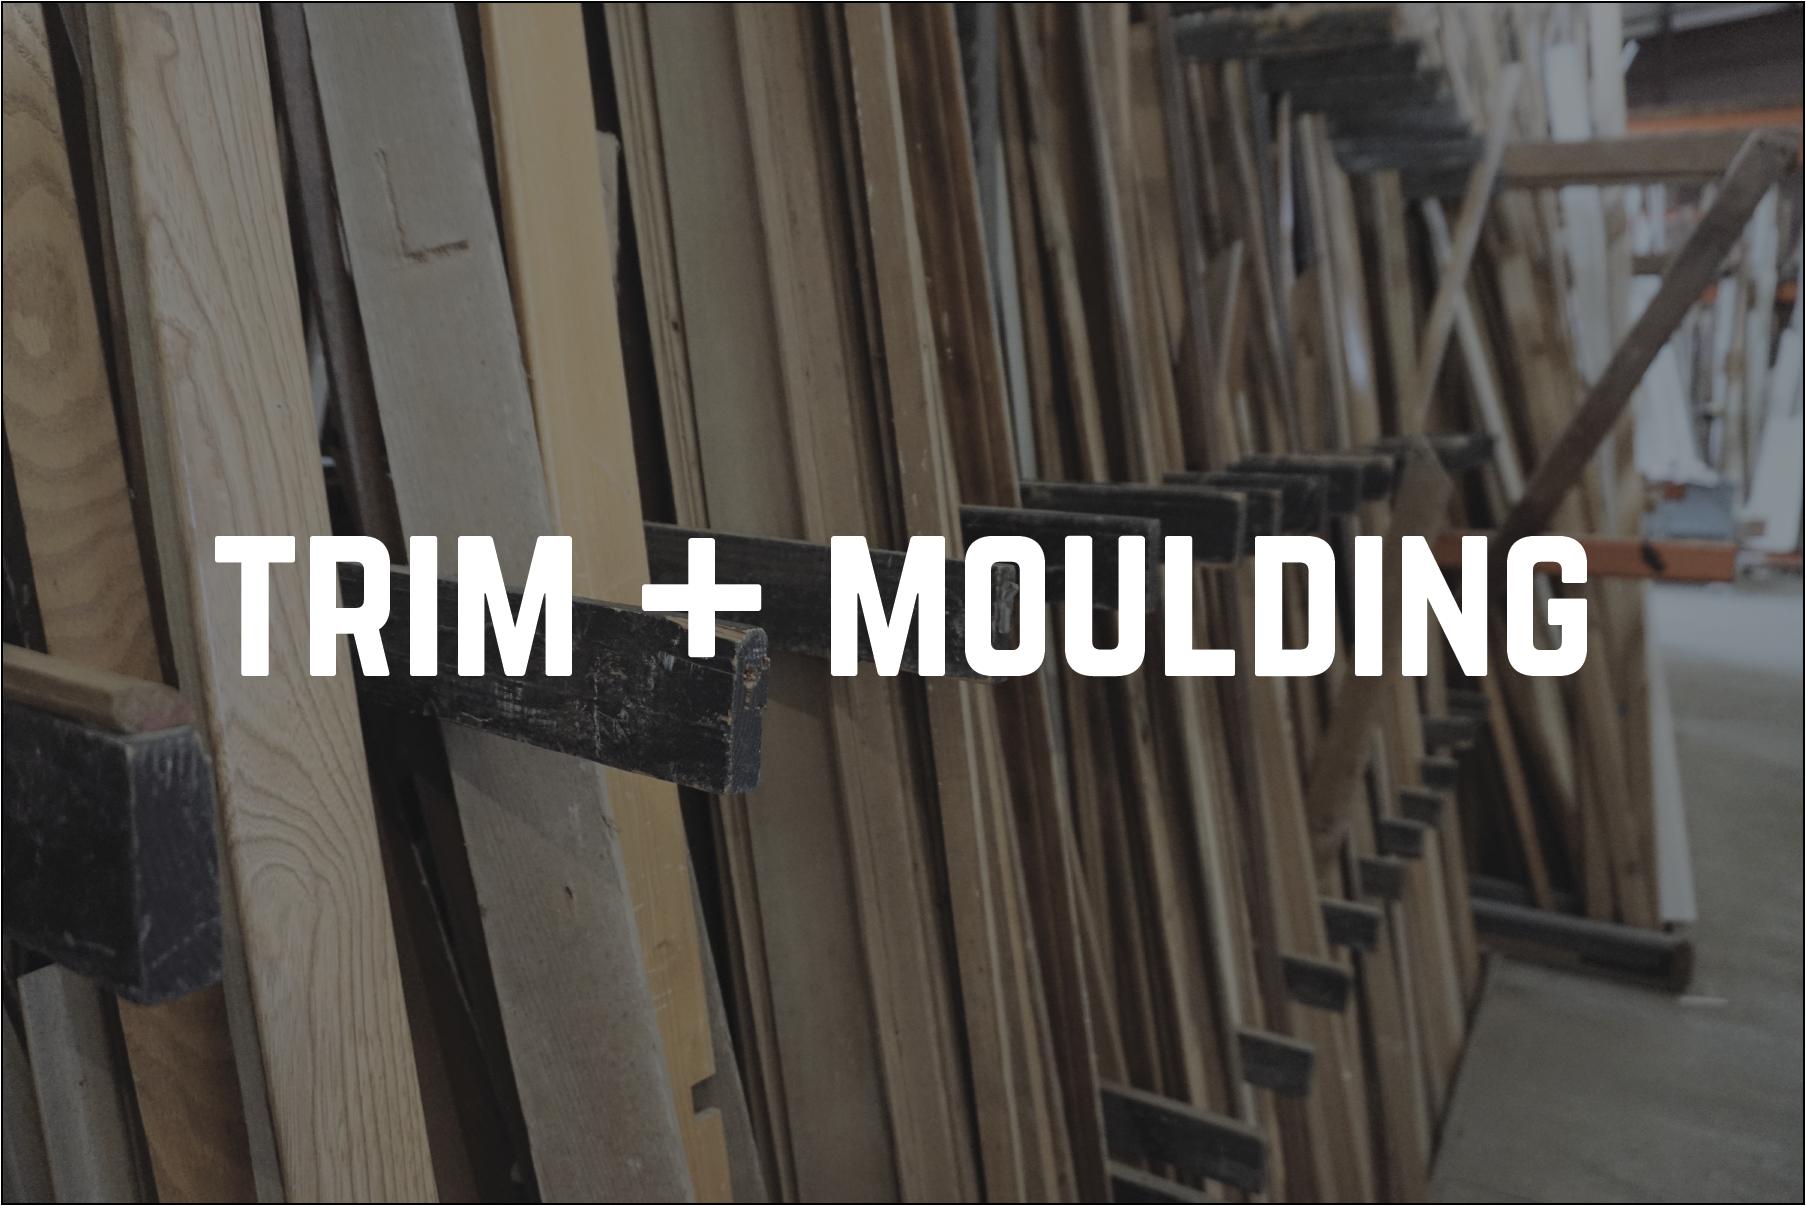 Trim + Moulding.png